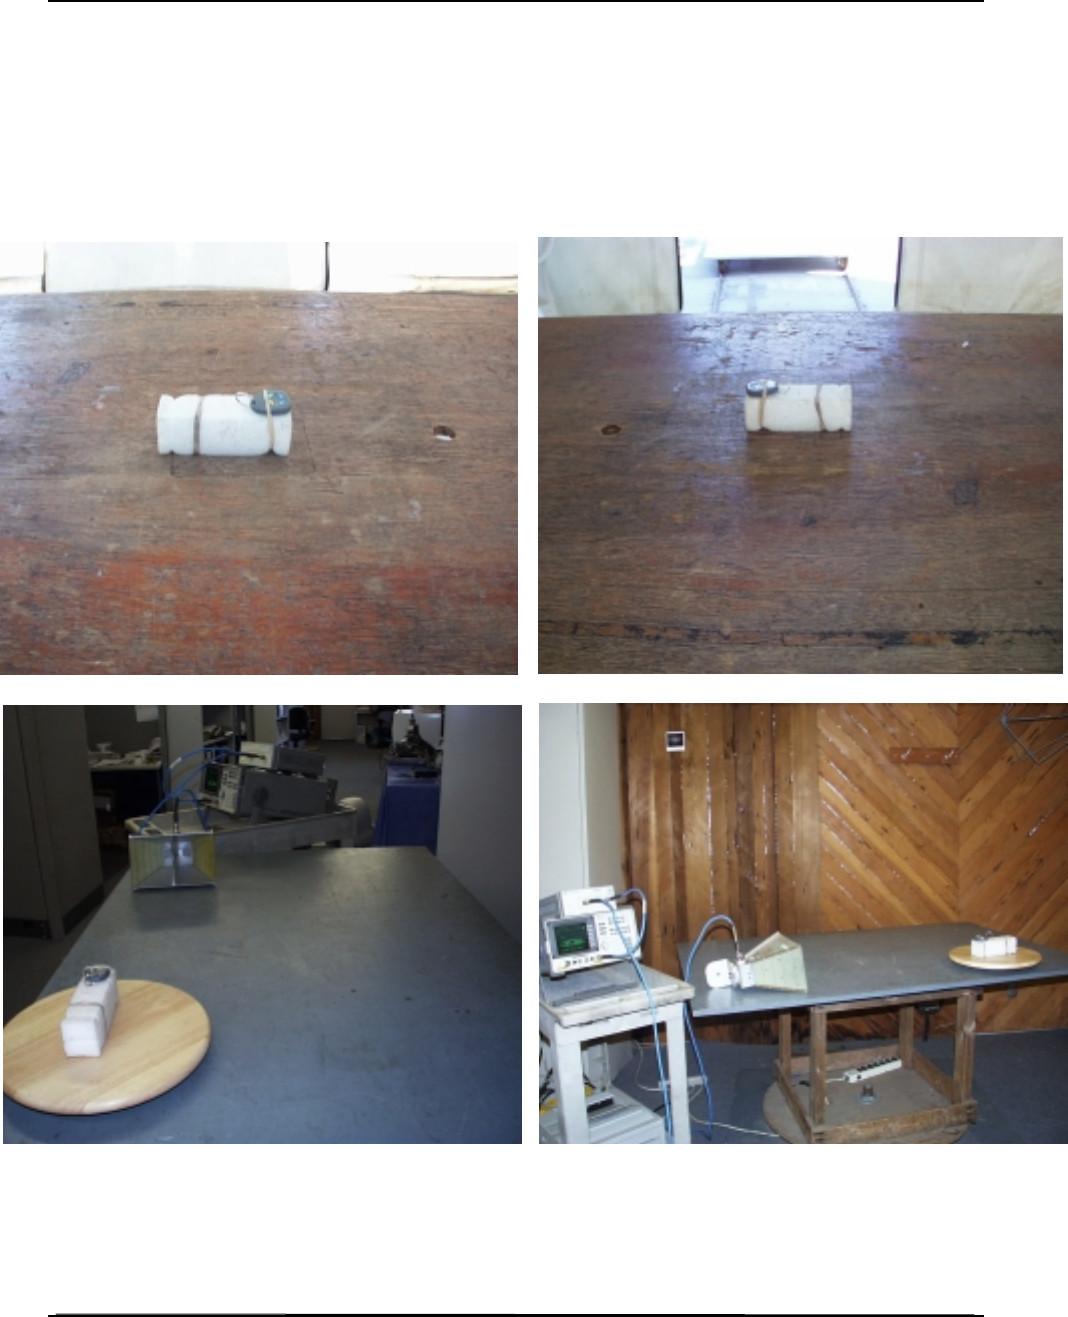 dm hardwood floors of at0d car alarm transmitter test report nutek corporation intended for report no 00t0304 1 fcc id elvat0d date june 22 2000